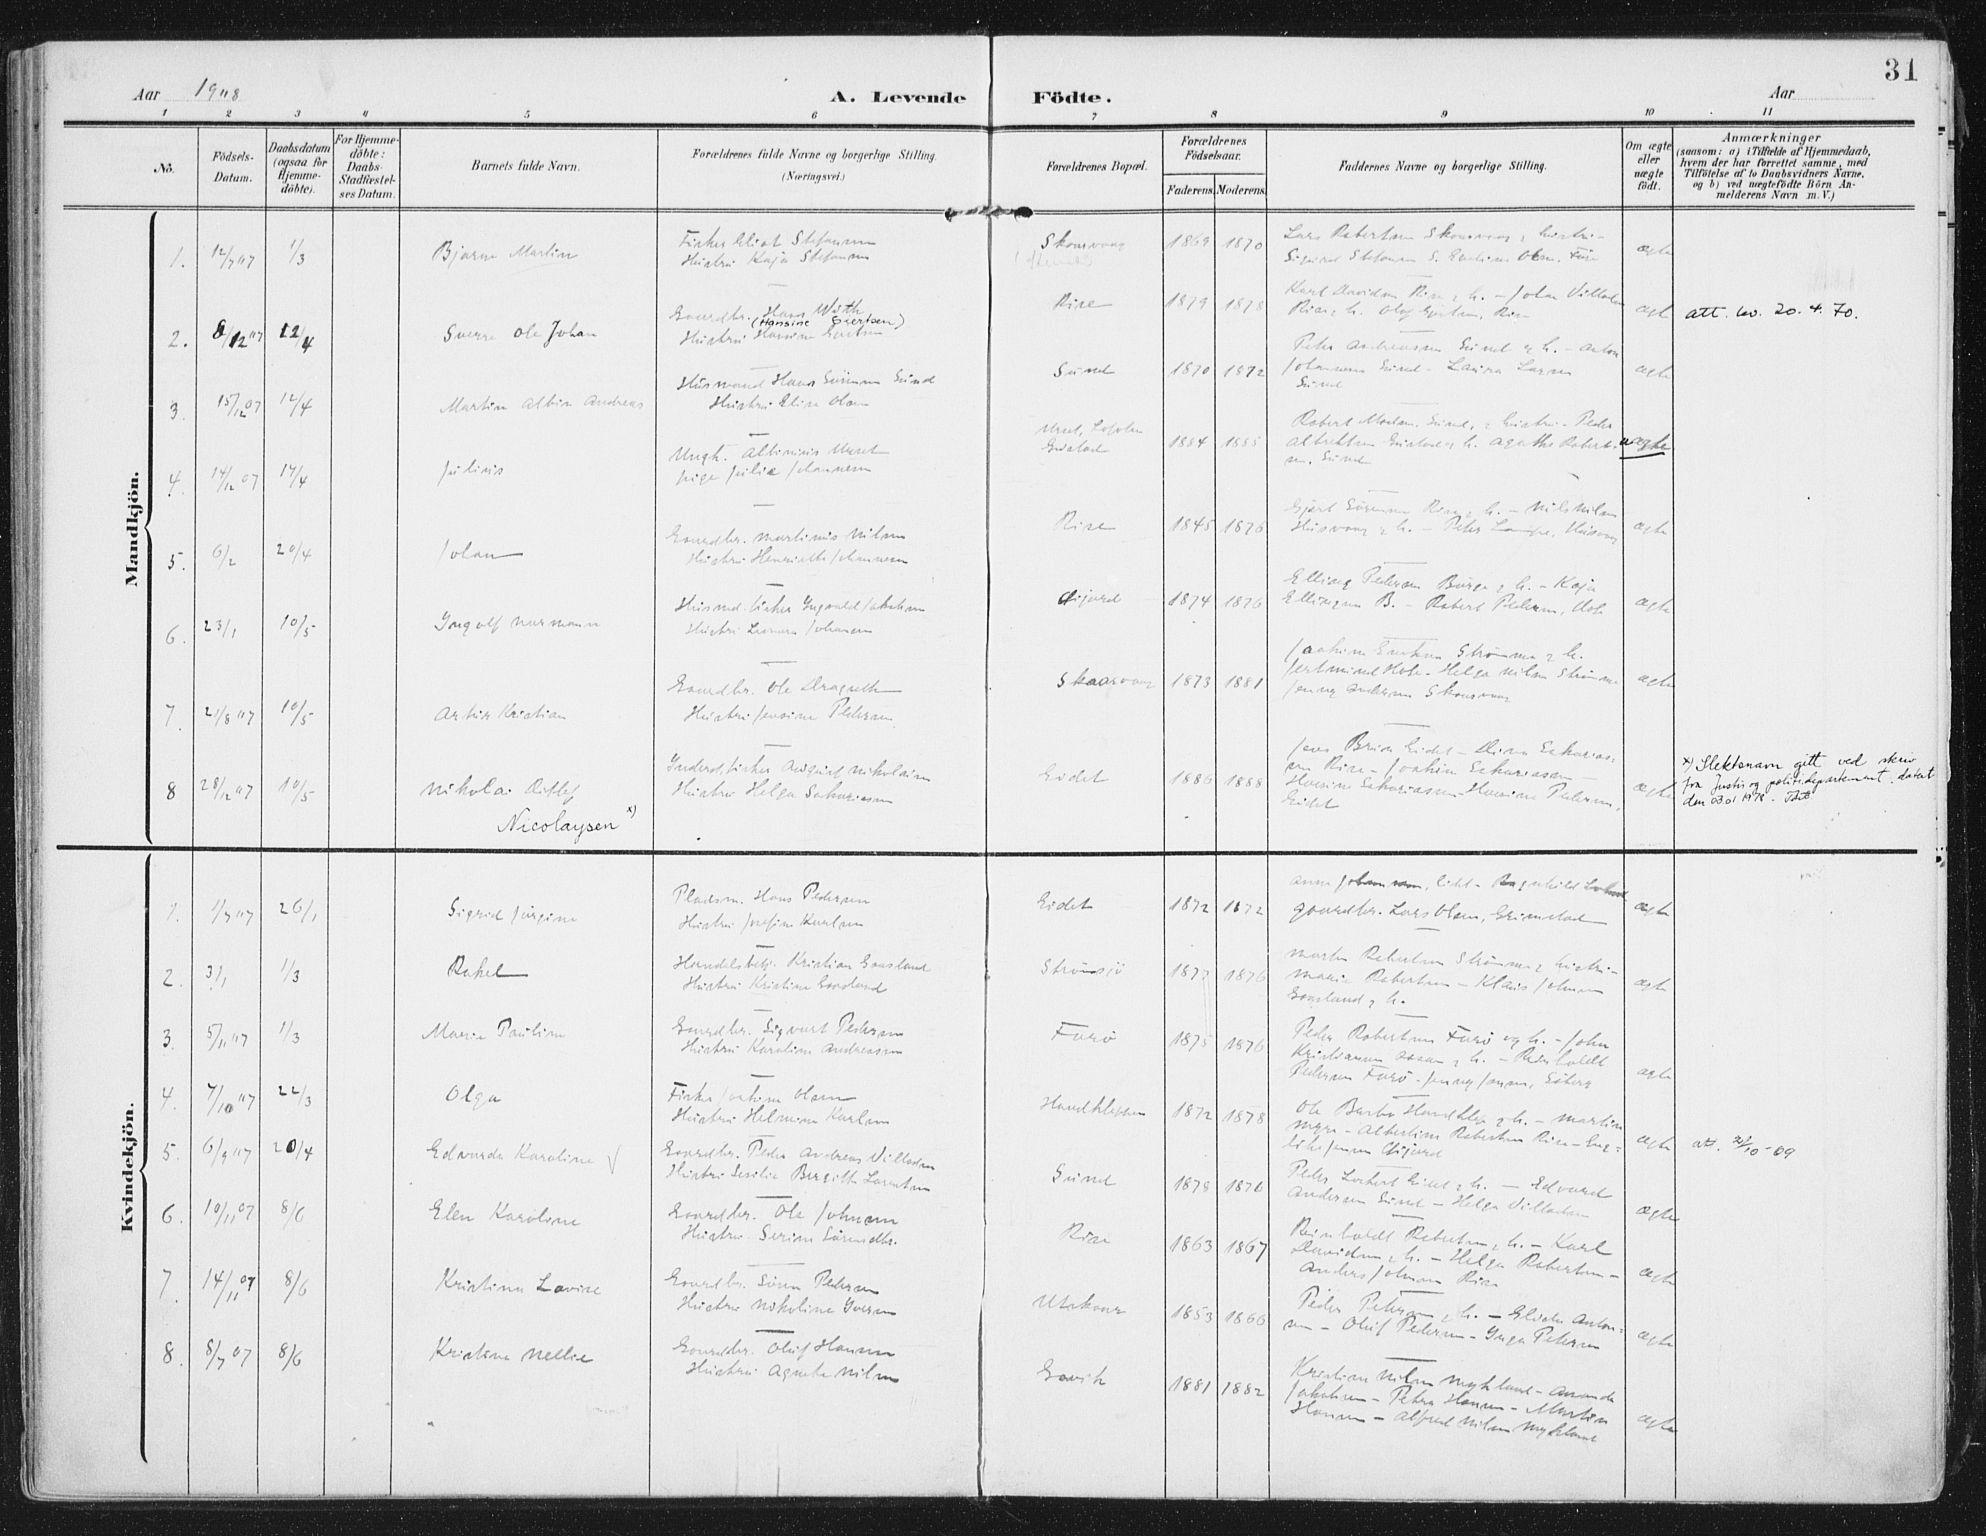 SAT, Ministerialprotokoller, klokkerbøker og fødselsregistre - Nordland, 892/L1321: Ministerialbok nr. 892A02, 1902-1918, s. 31